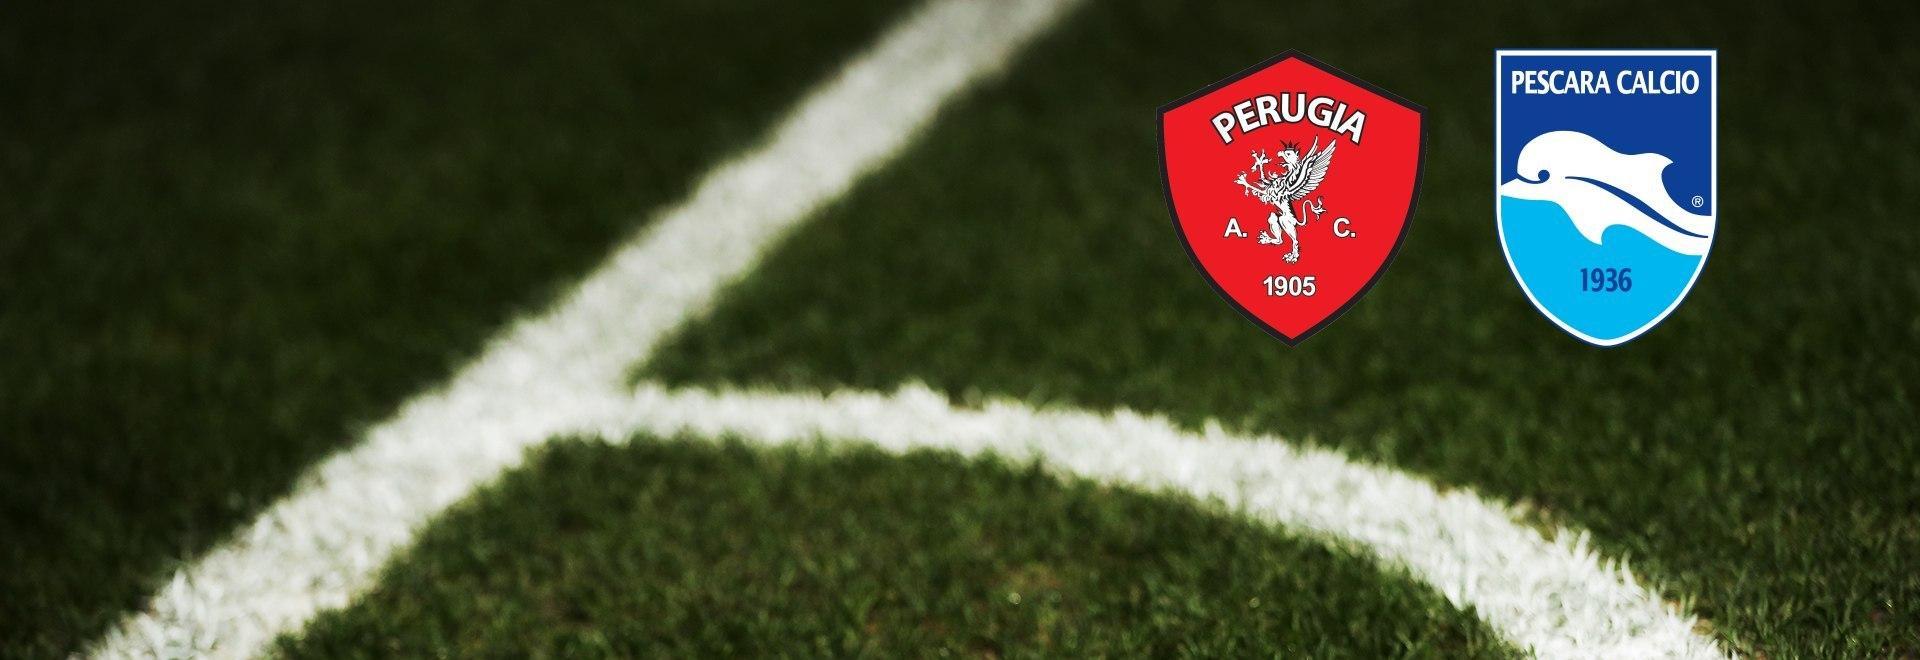 Perugia - Pescara. Playout Ritorno